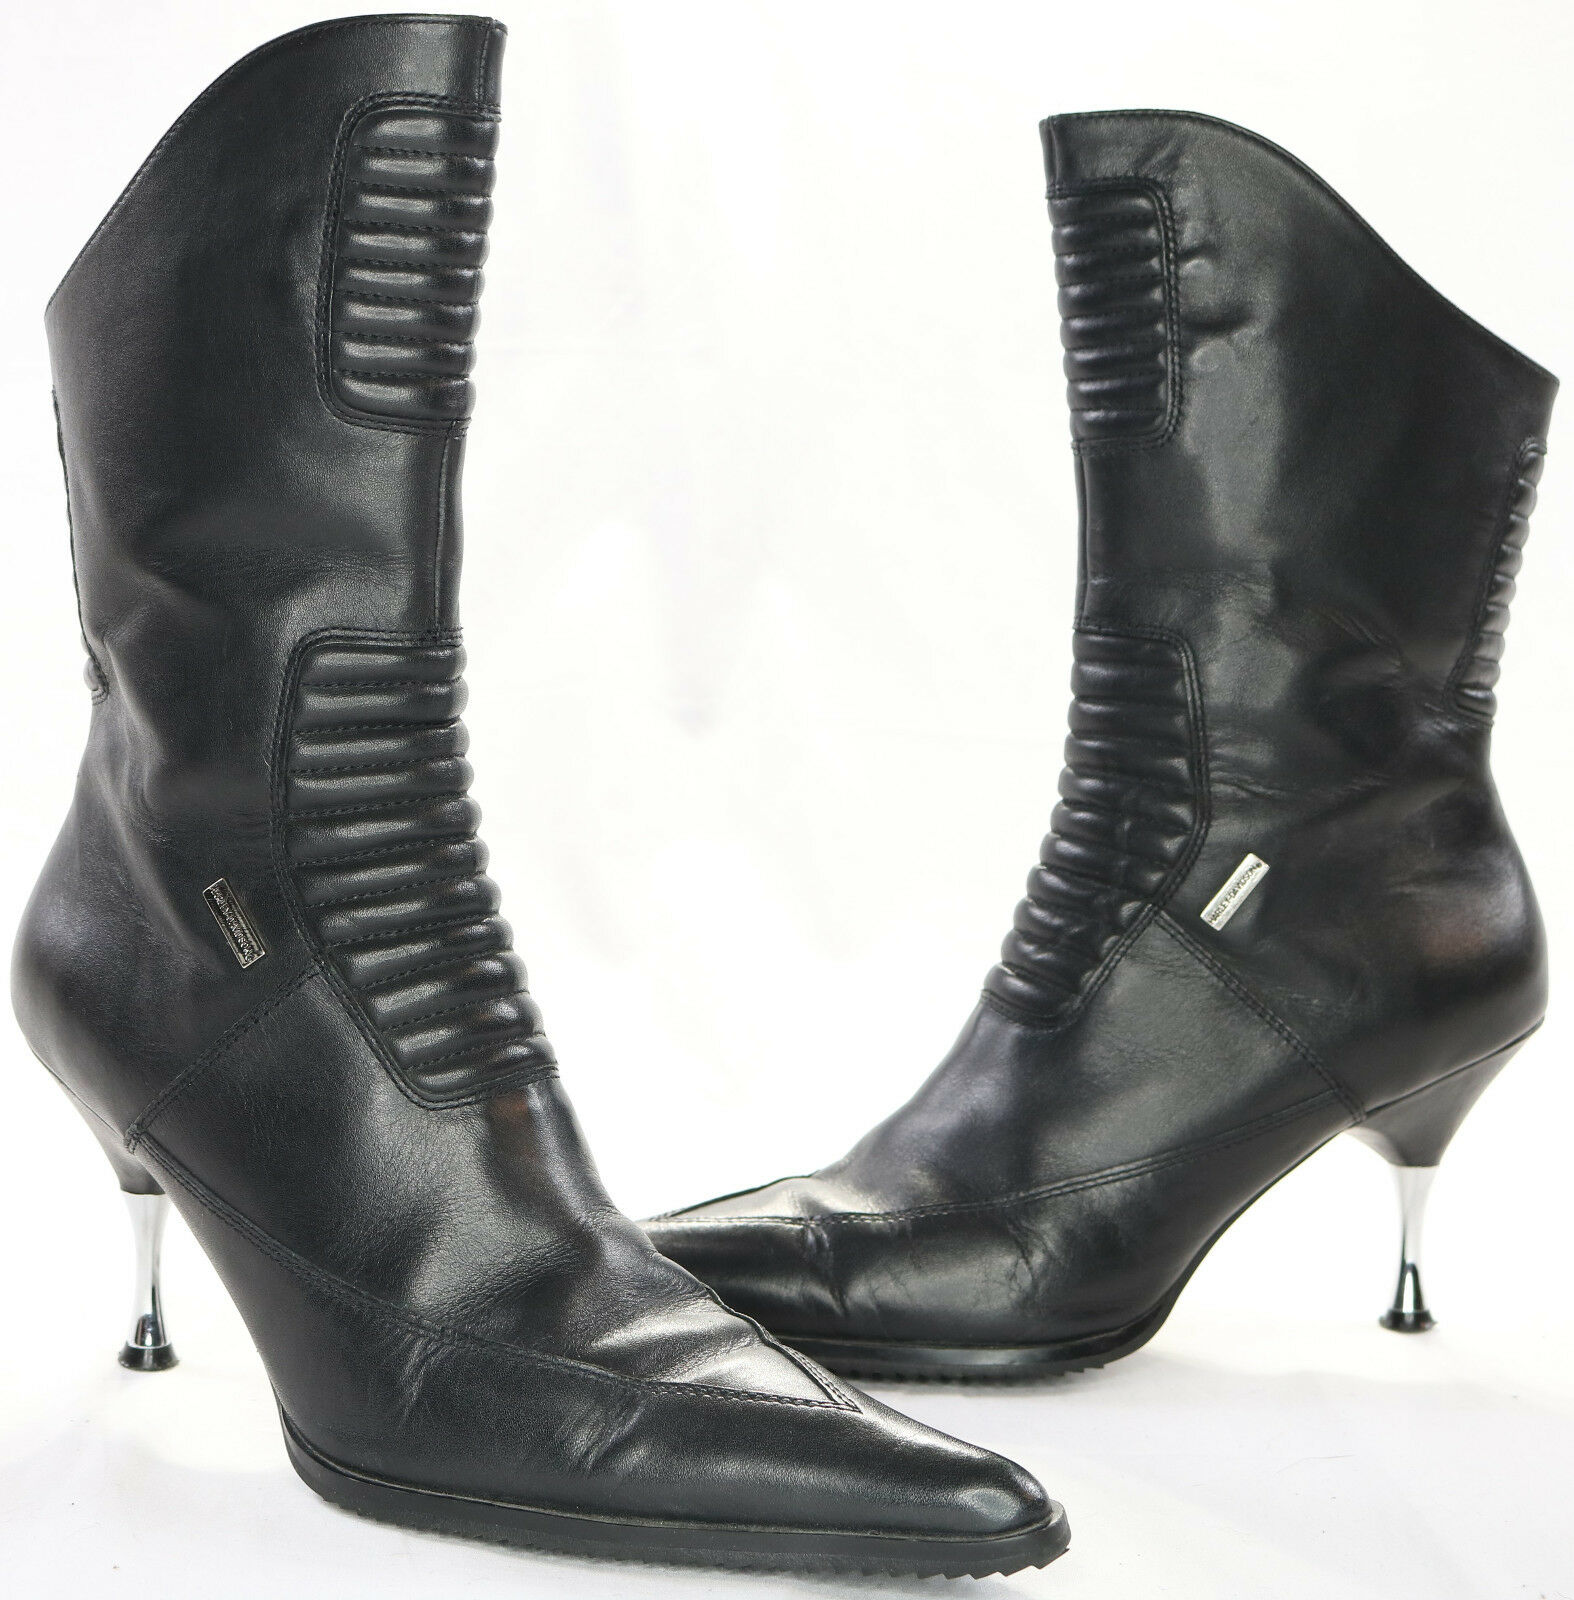 Womens harley davidson leather boots 7.5 black black black stiletto zip up pull on 85010 5b7b5f